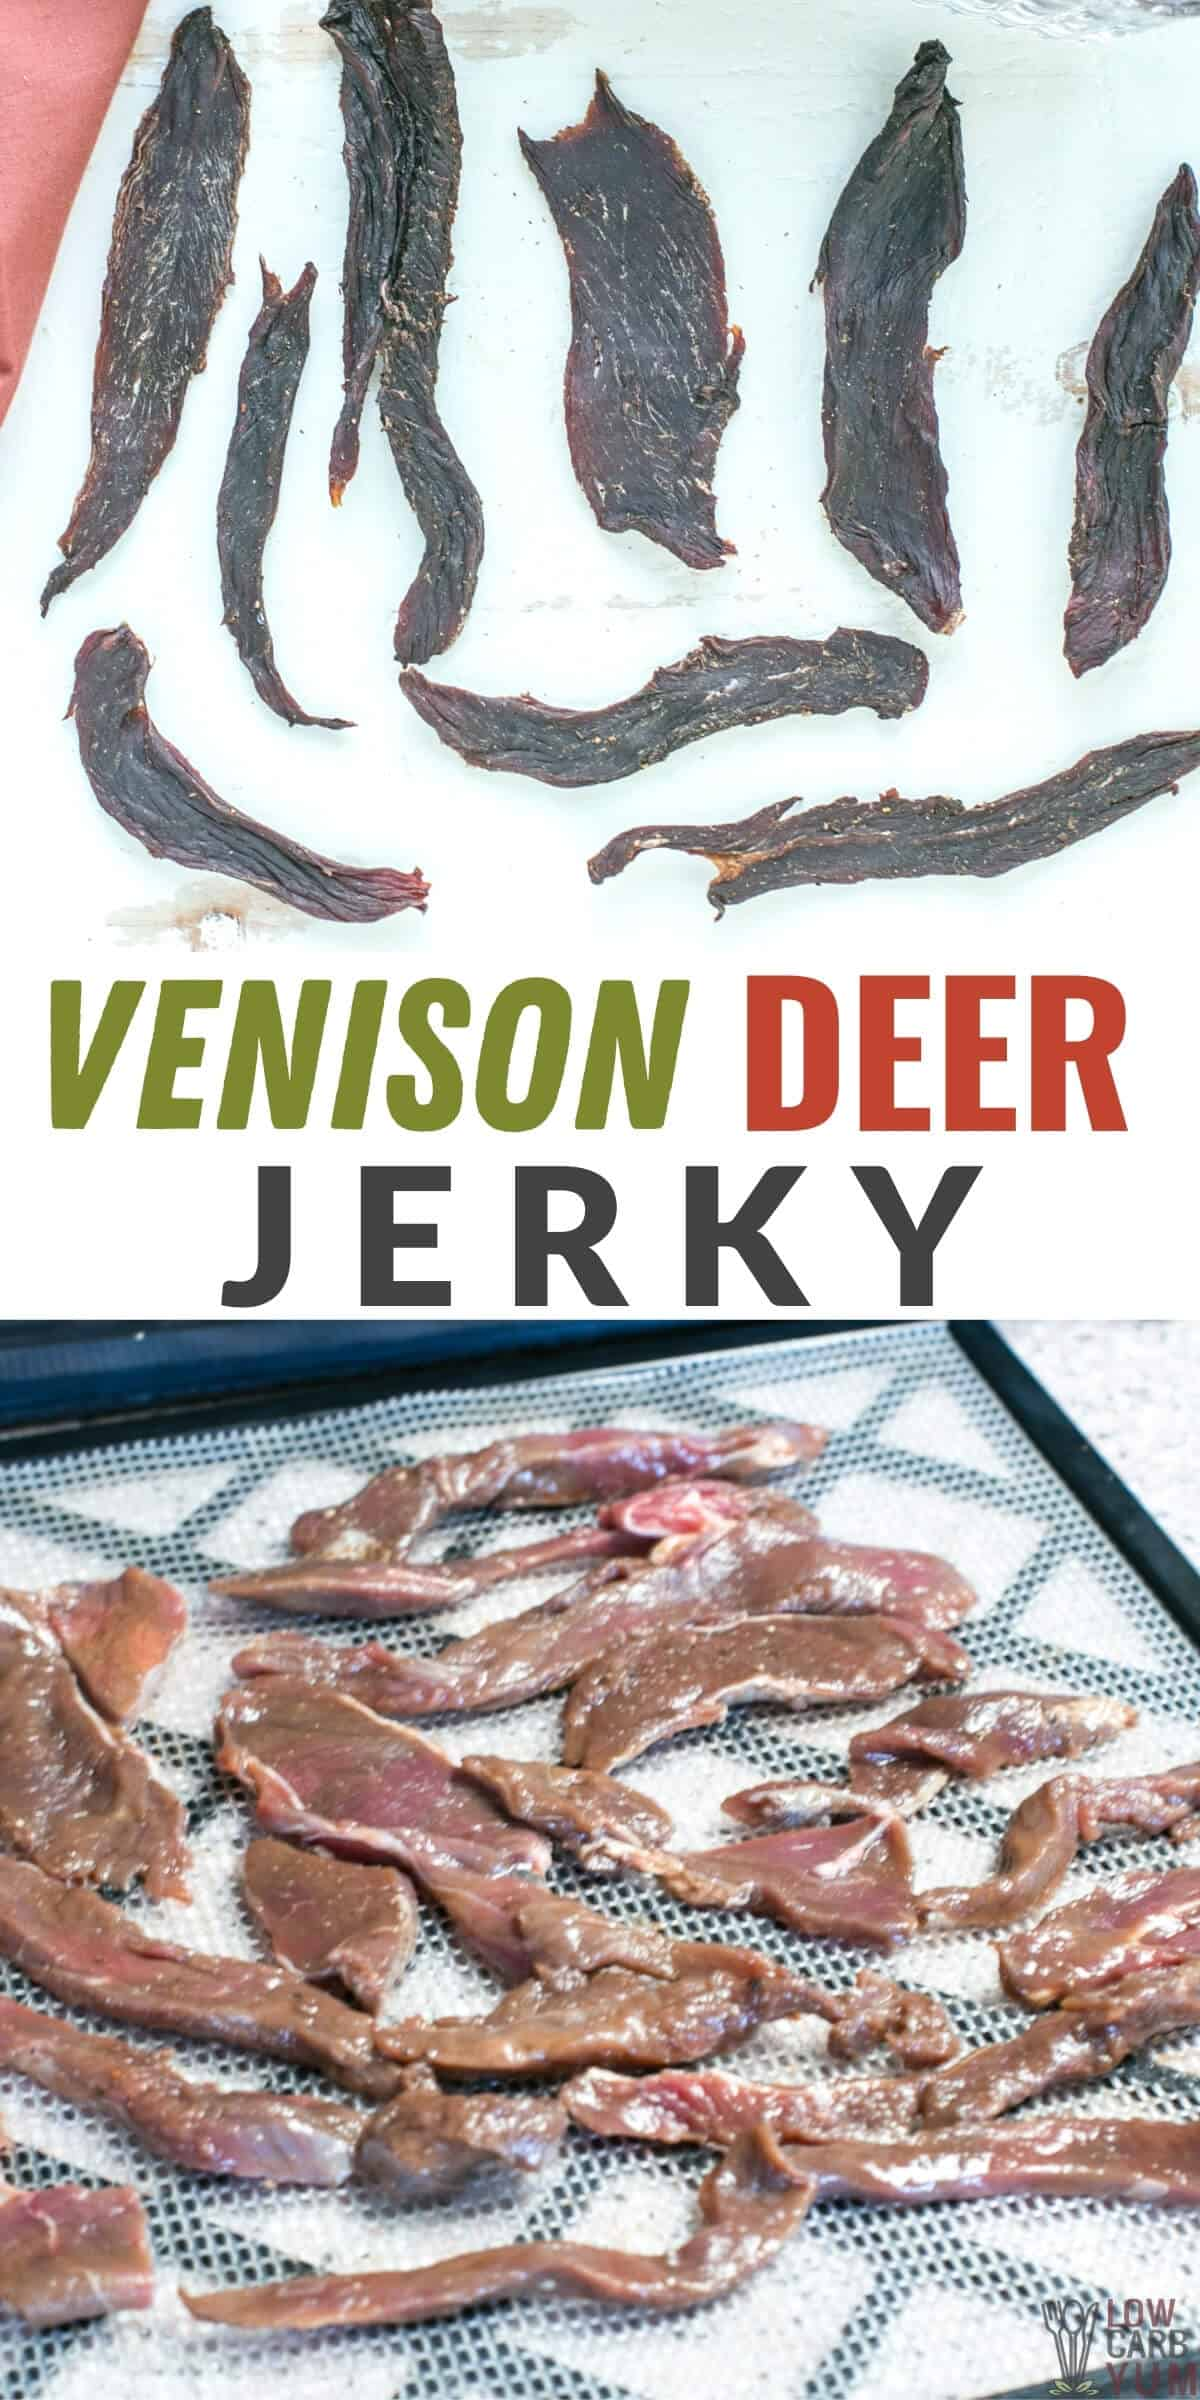 venison deer jerky pinterest image